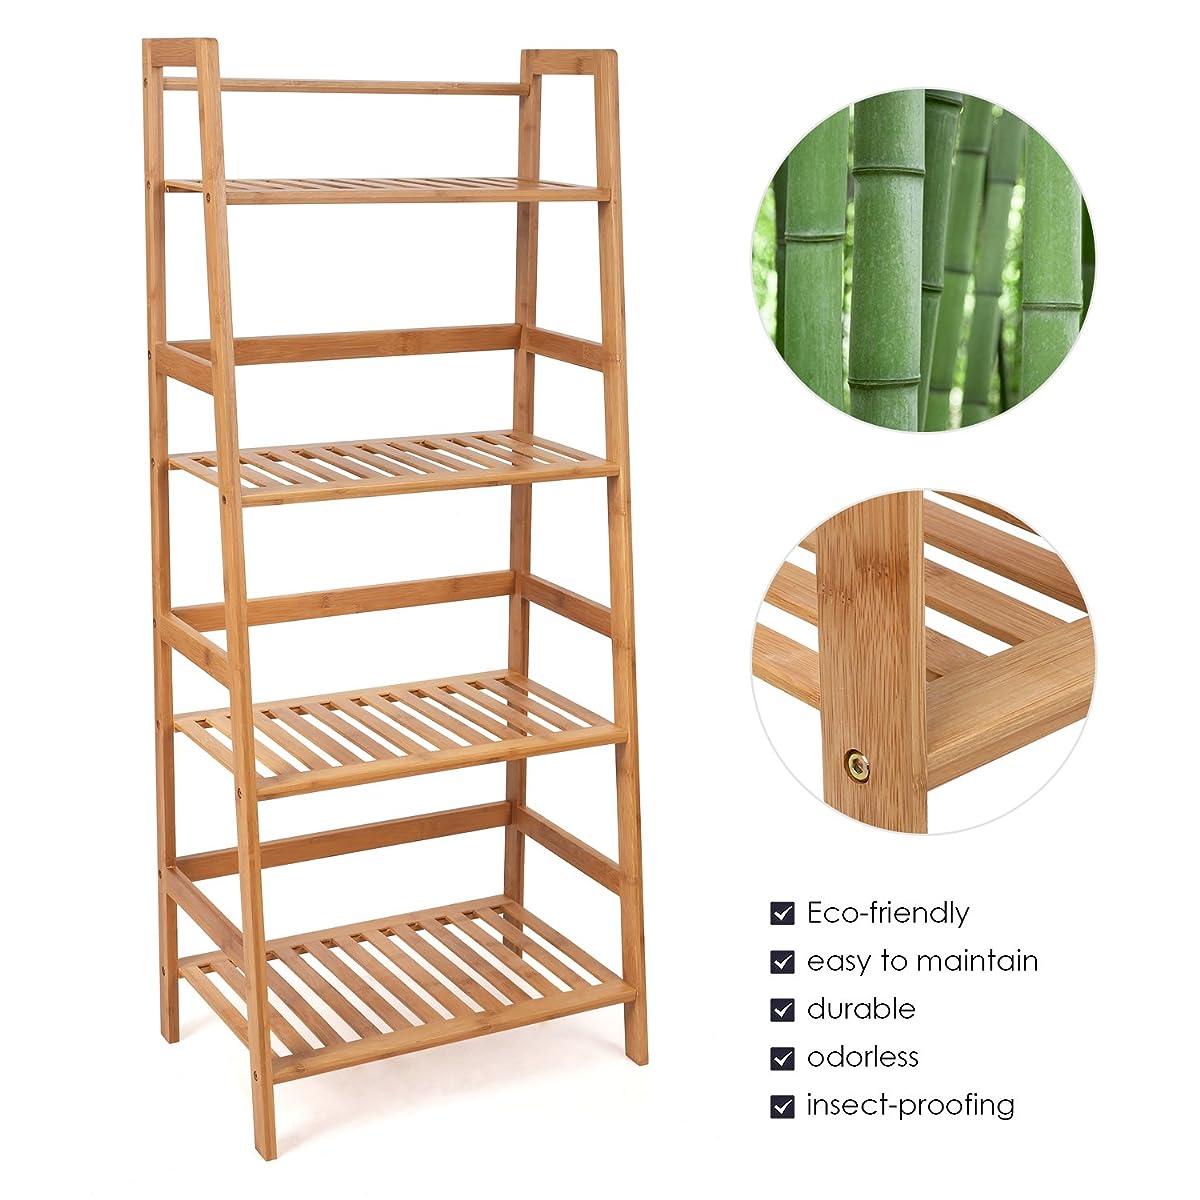 HOMFA Bamboo 4 Shelf Bookcase, Multifunctional Ladder-Shaped Plant Flower Stand Rack Bookrack Storage Shelves